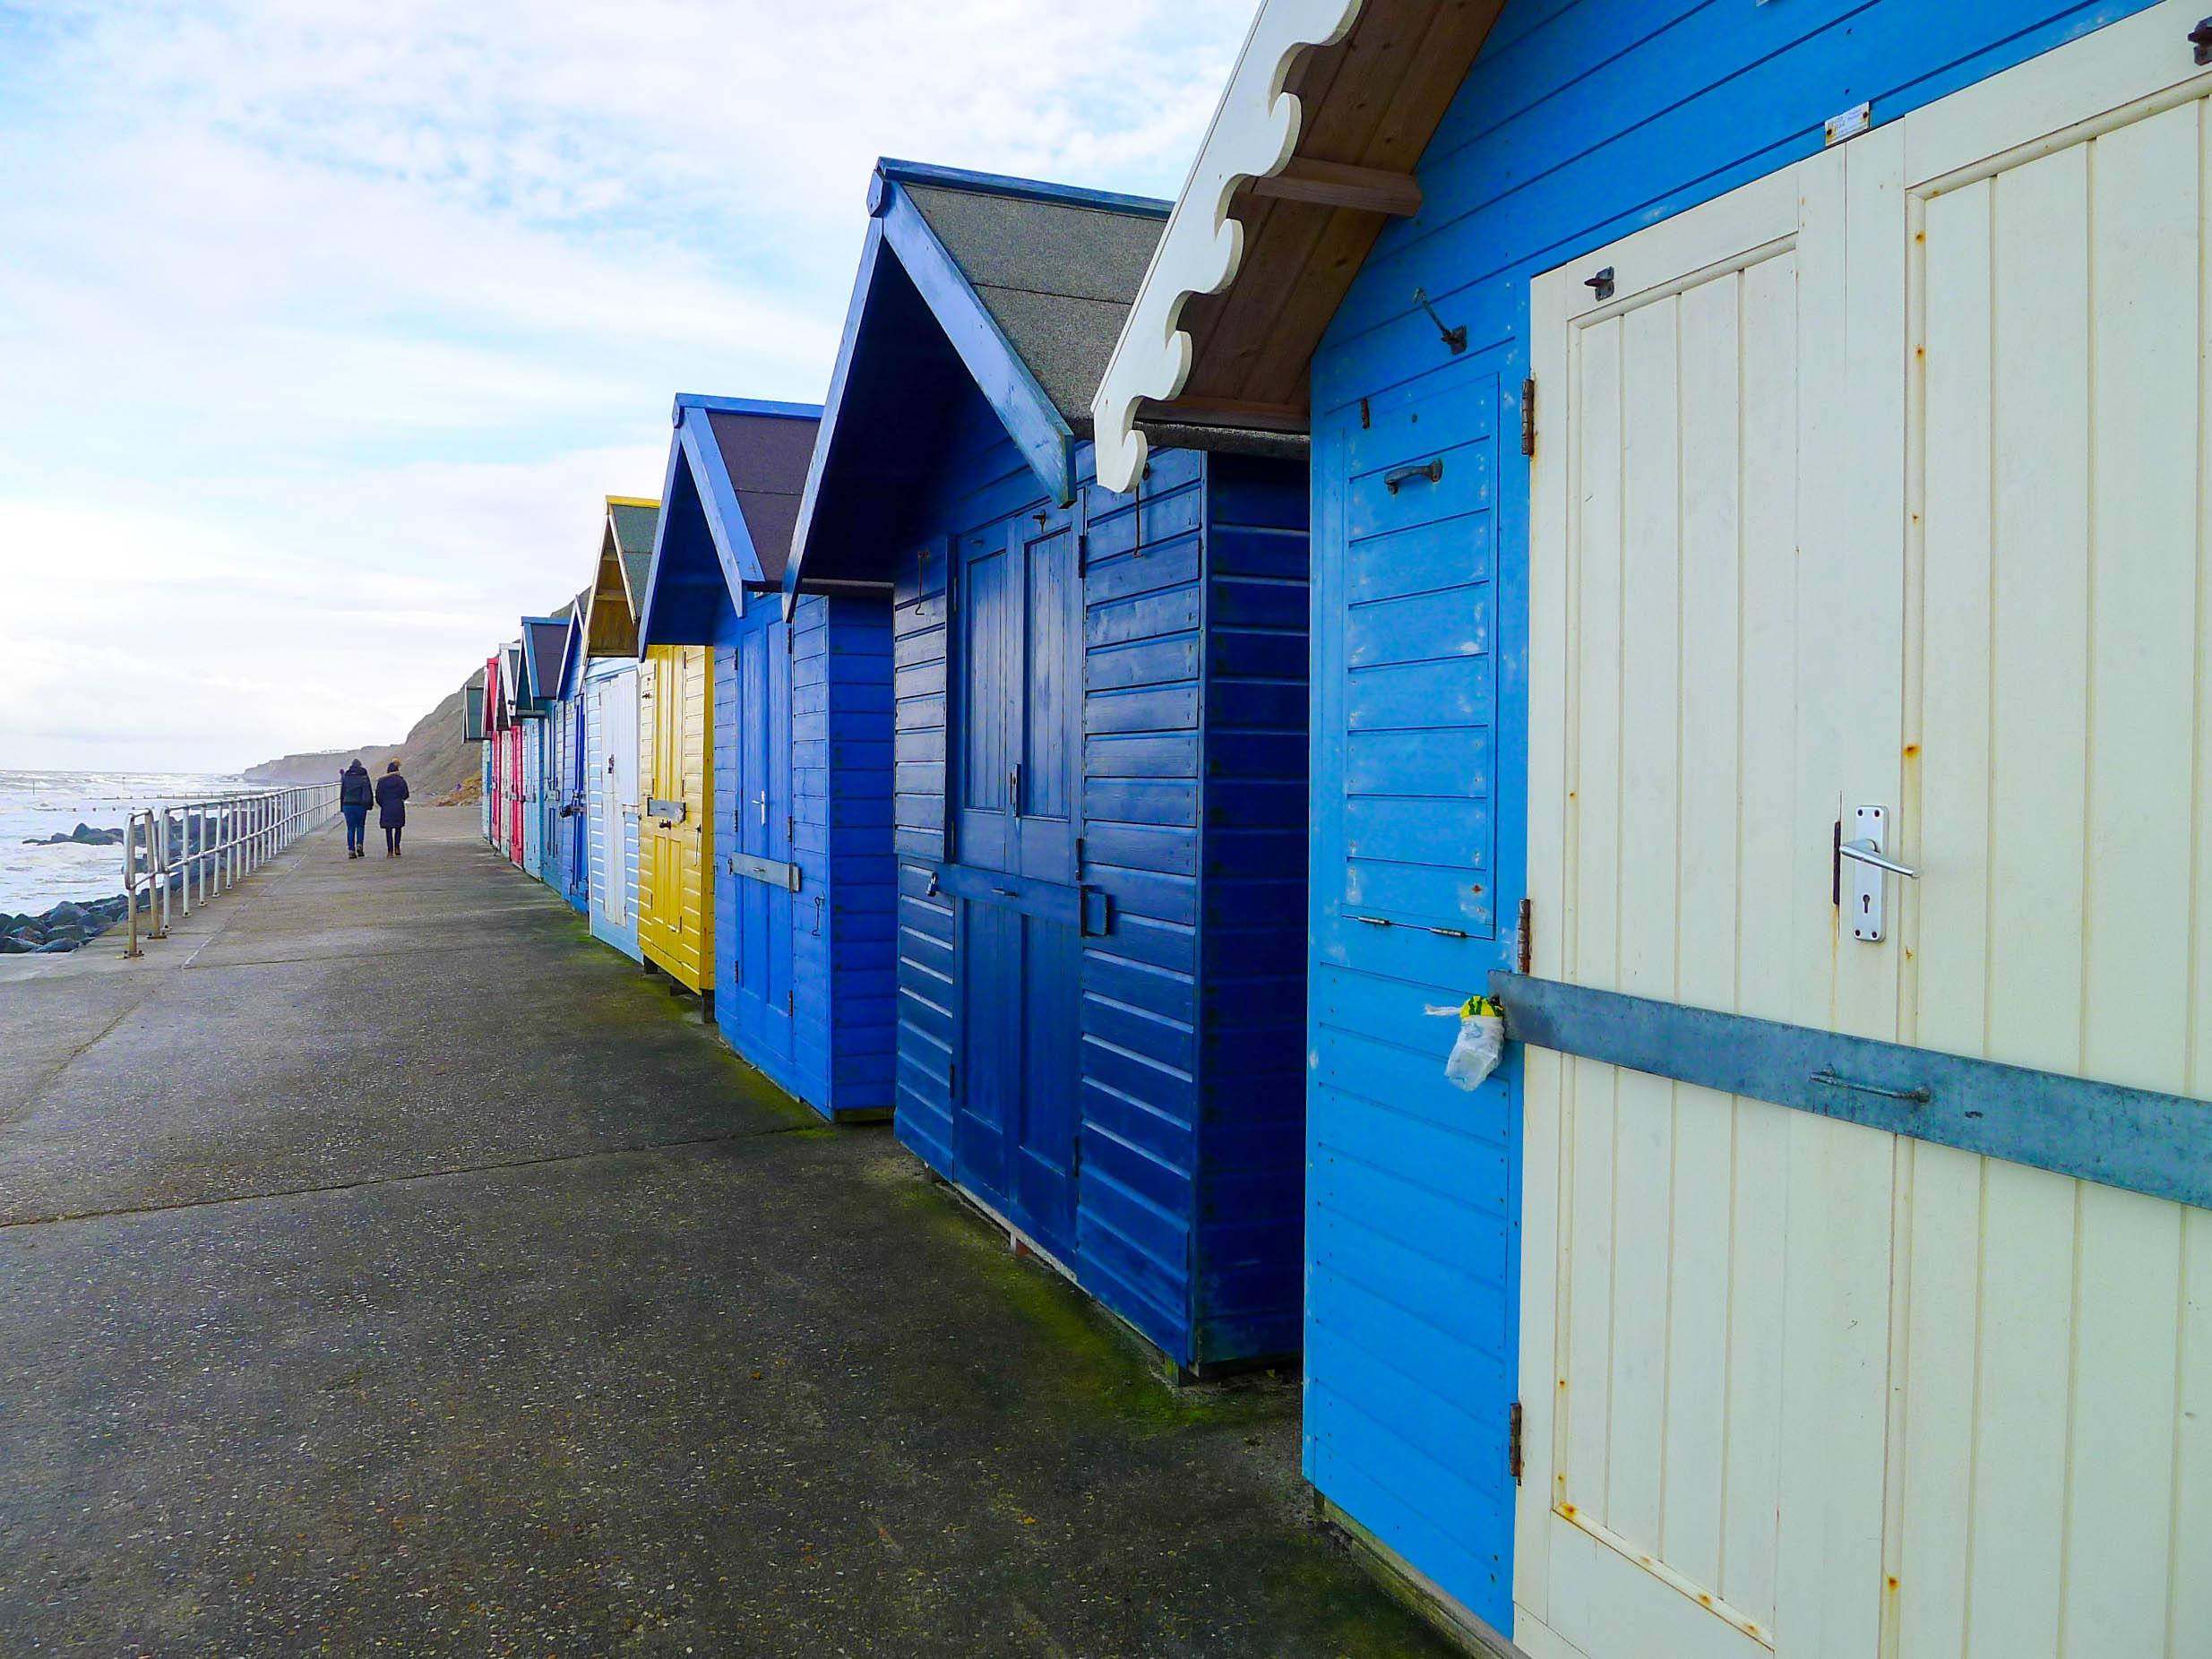 Sheringham Beach Huts